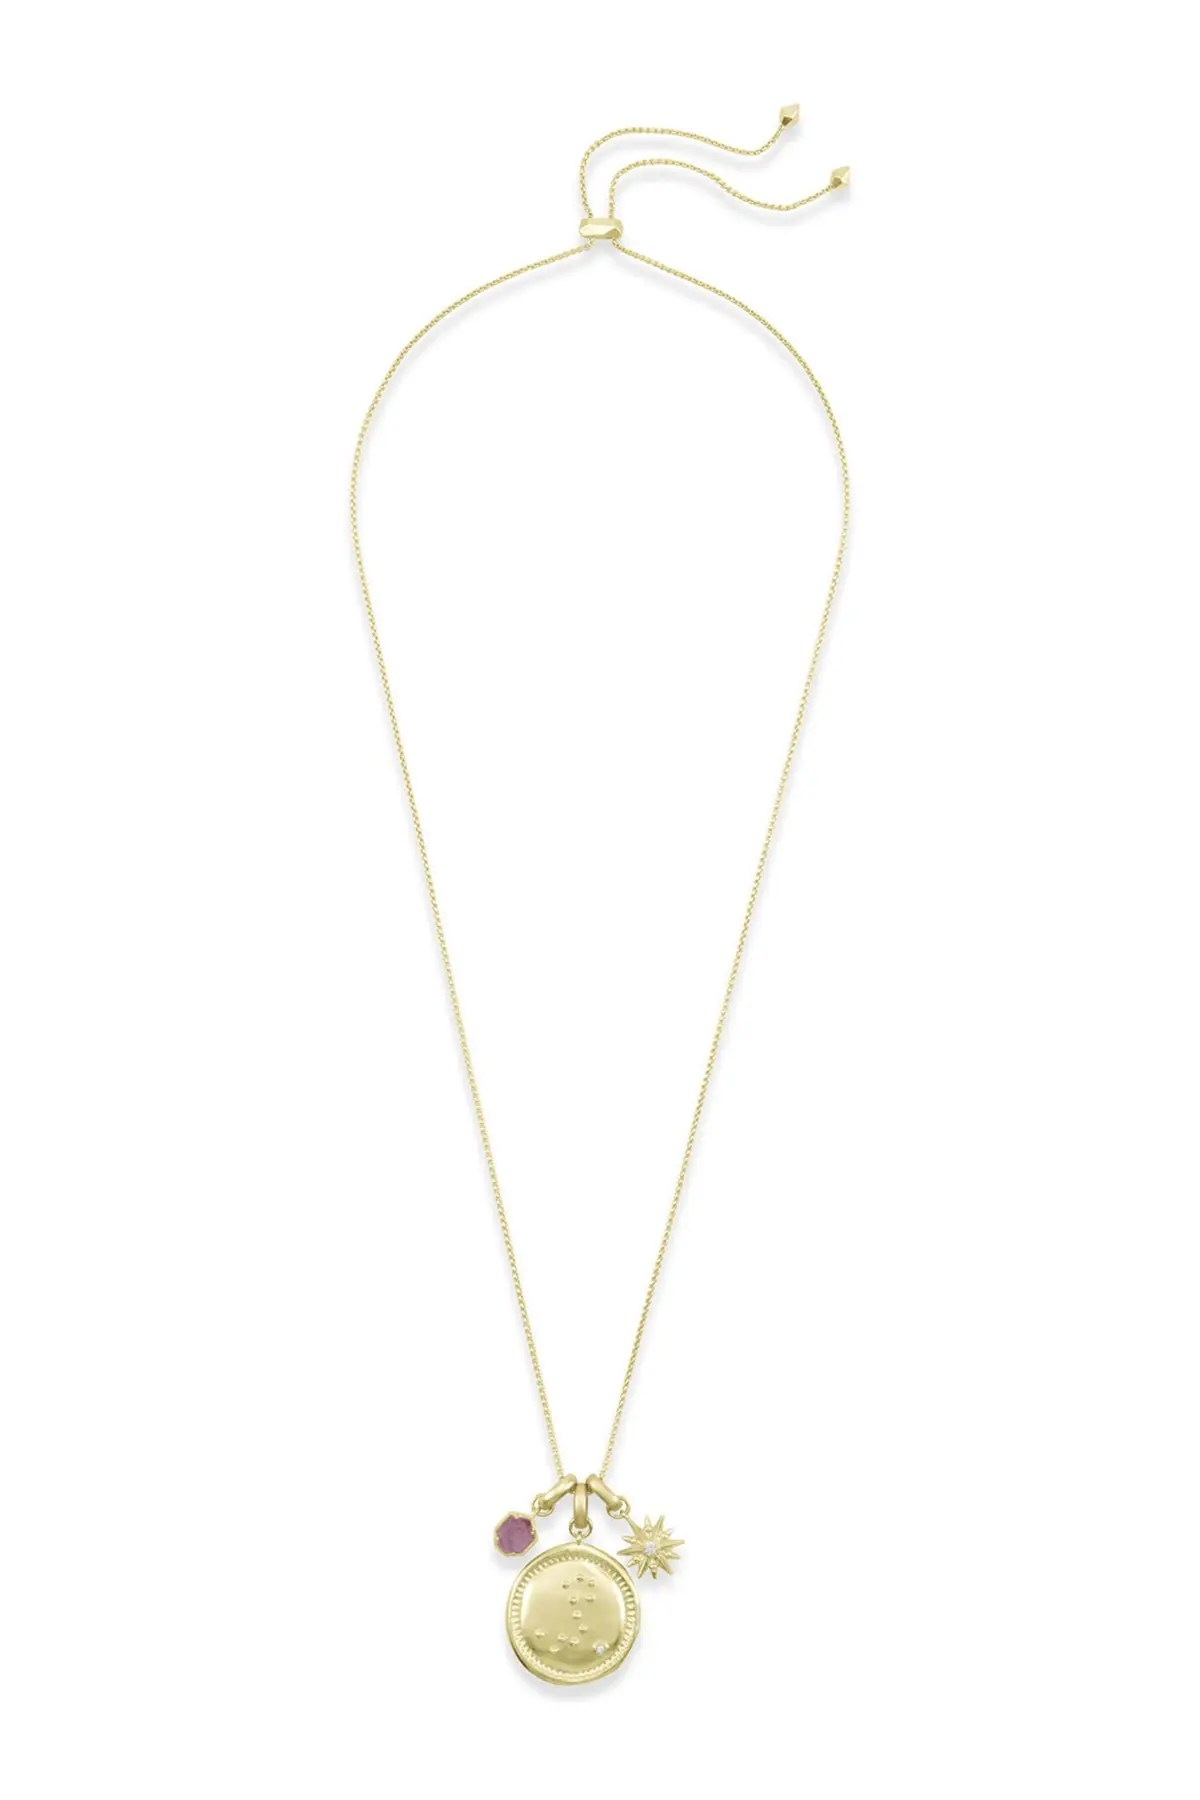 kendra scott 14k gold plated pisces charm necklace nordstrom rack